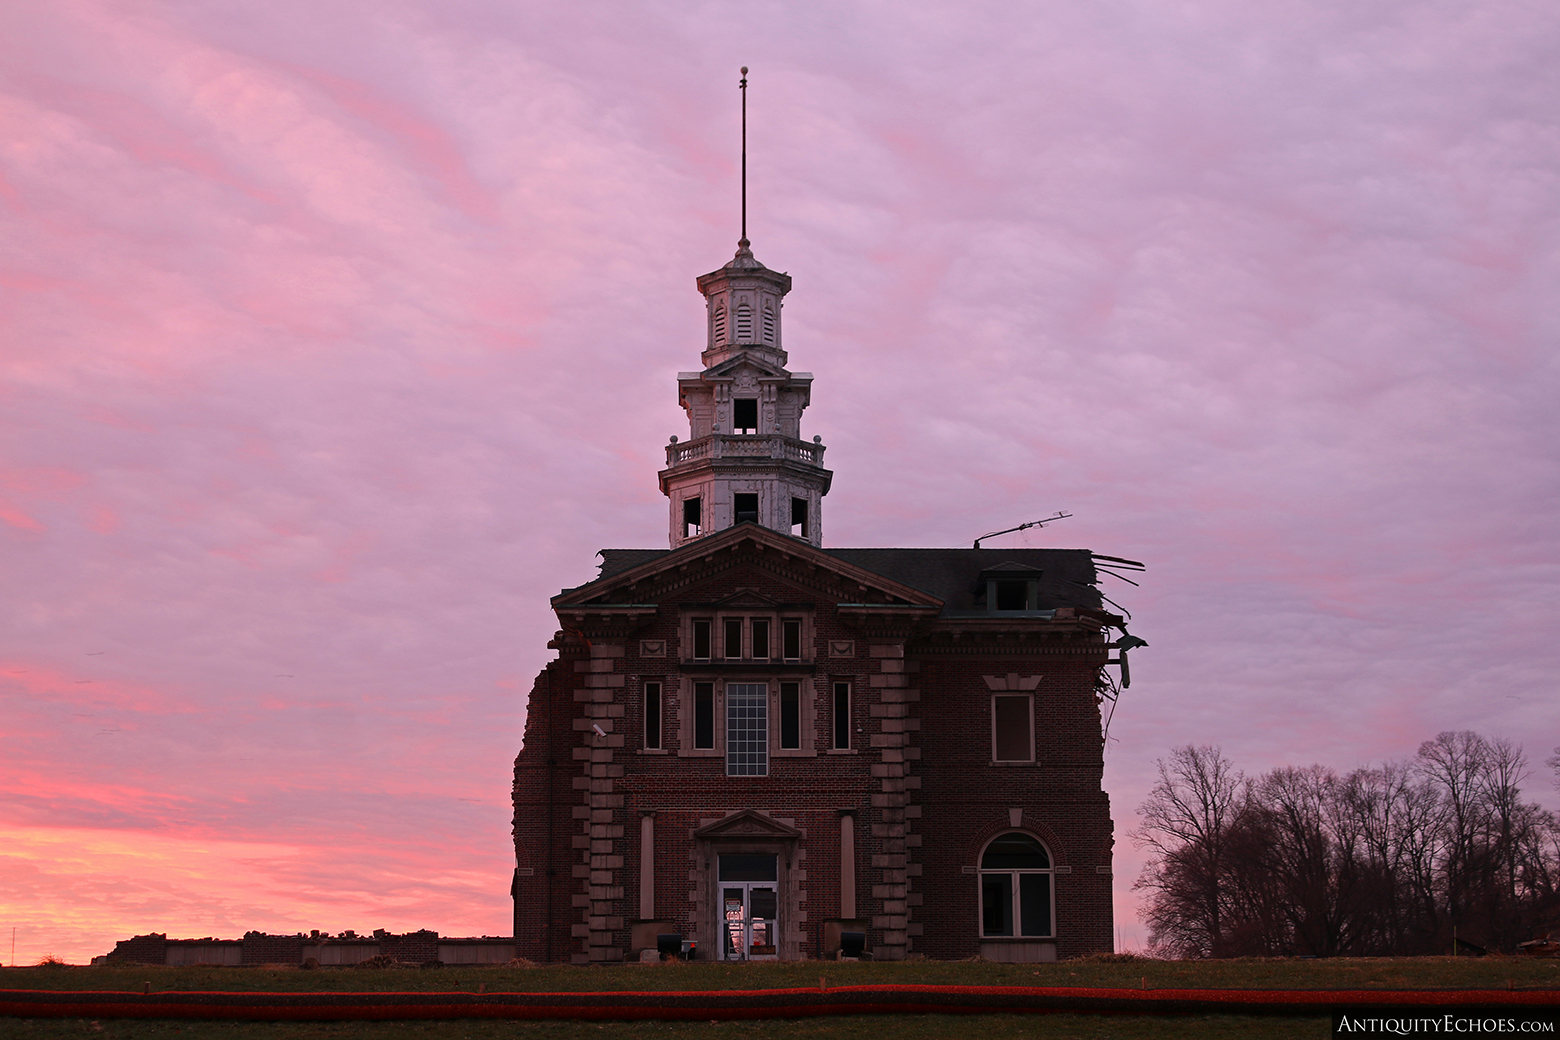 Allentown State Hospital - Demolition - The Last Sunrise